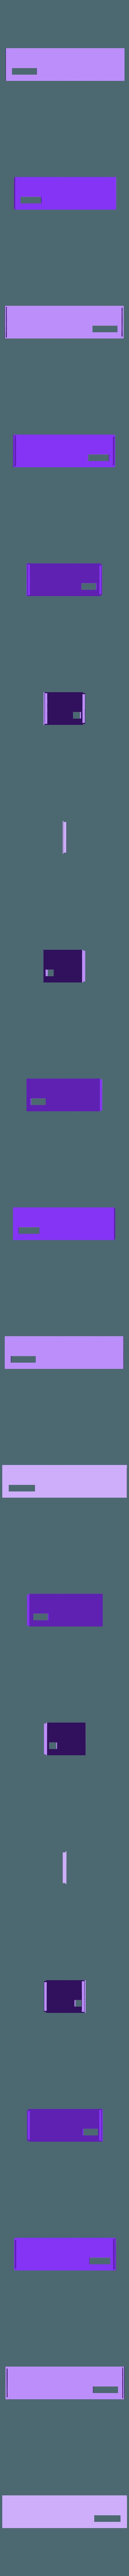 tapa frente cnc 2.STL Download free GCODE file control panel for cnc grbl • 3D printable model, franhabas